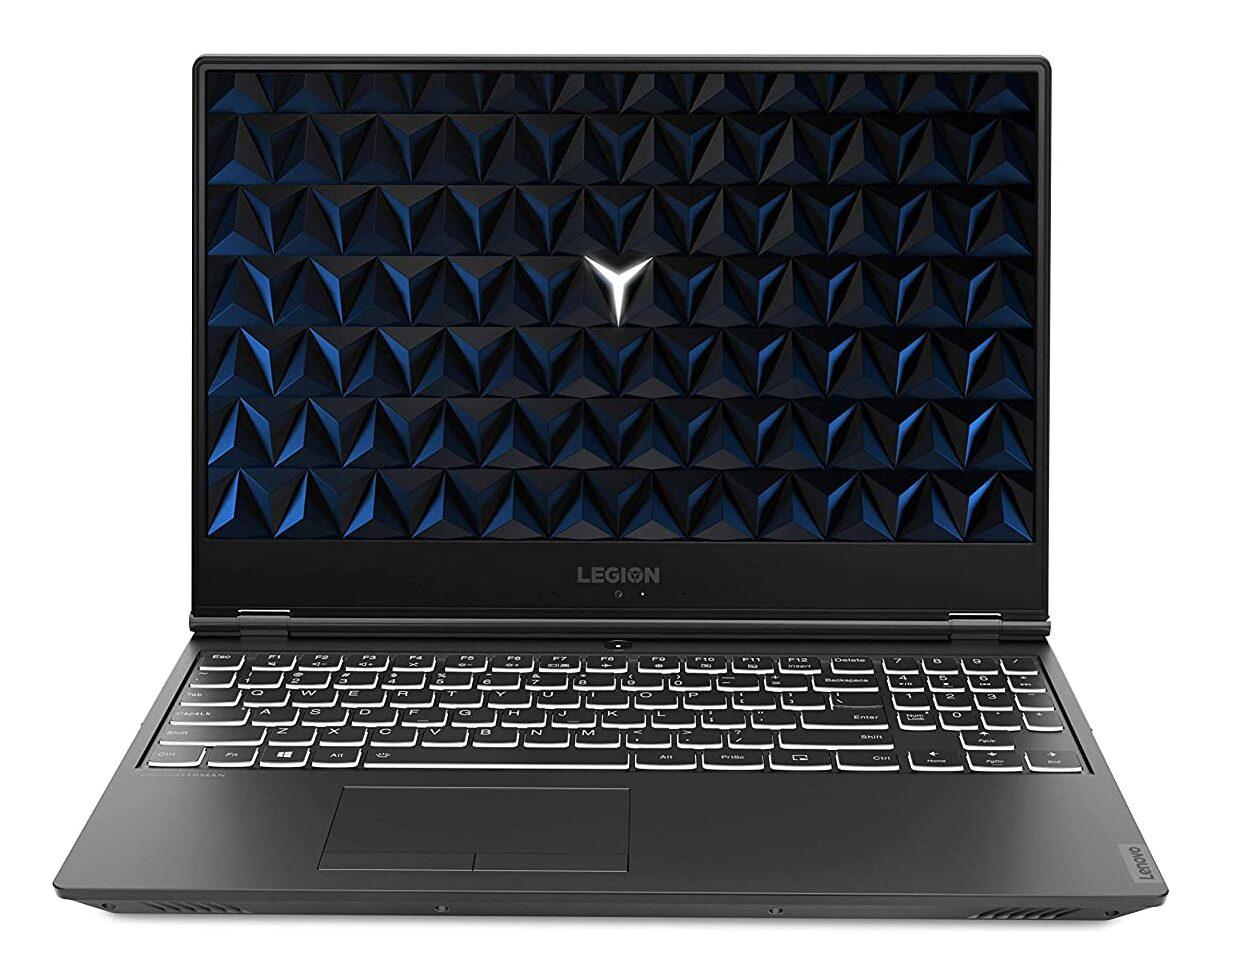 best laptop under 70000 in India 2020 - Lenovo Legion Y540 81SY00SUIN